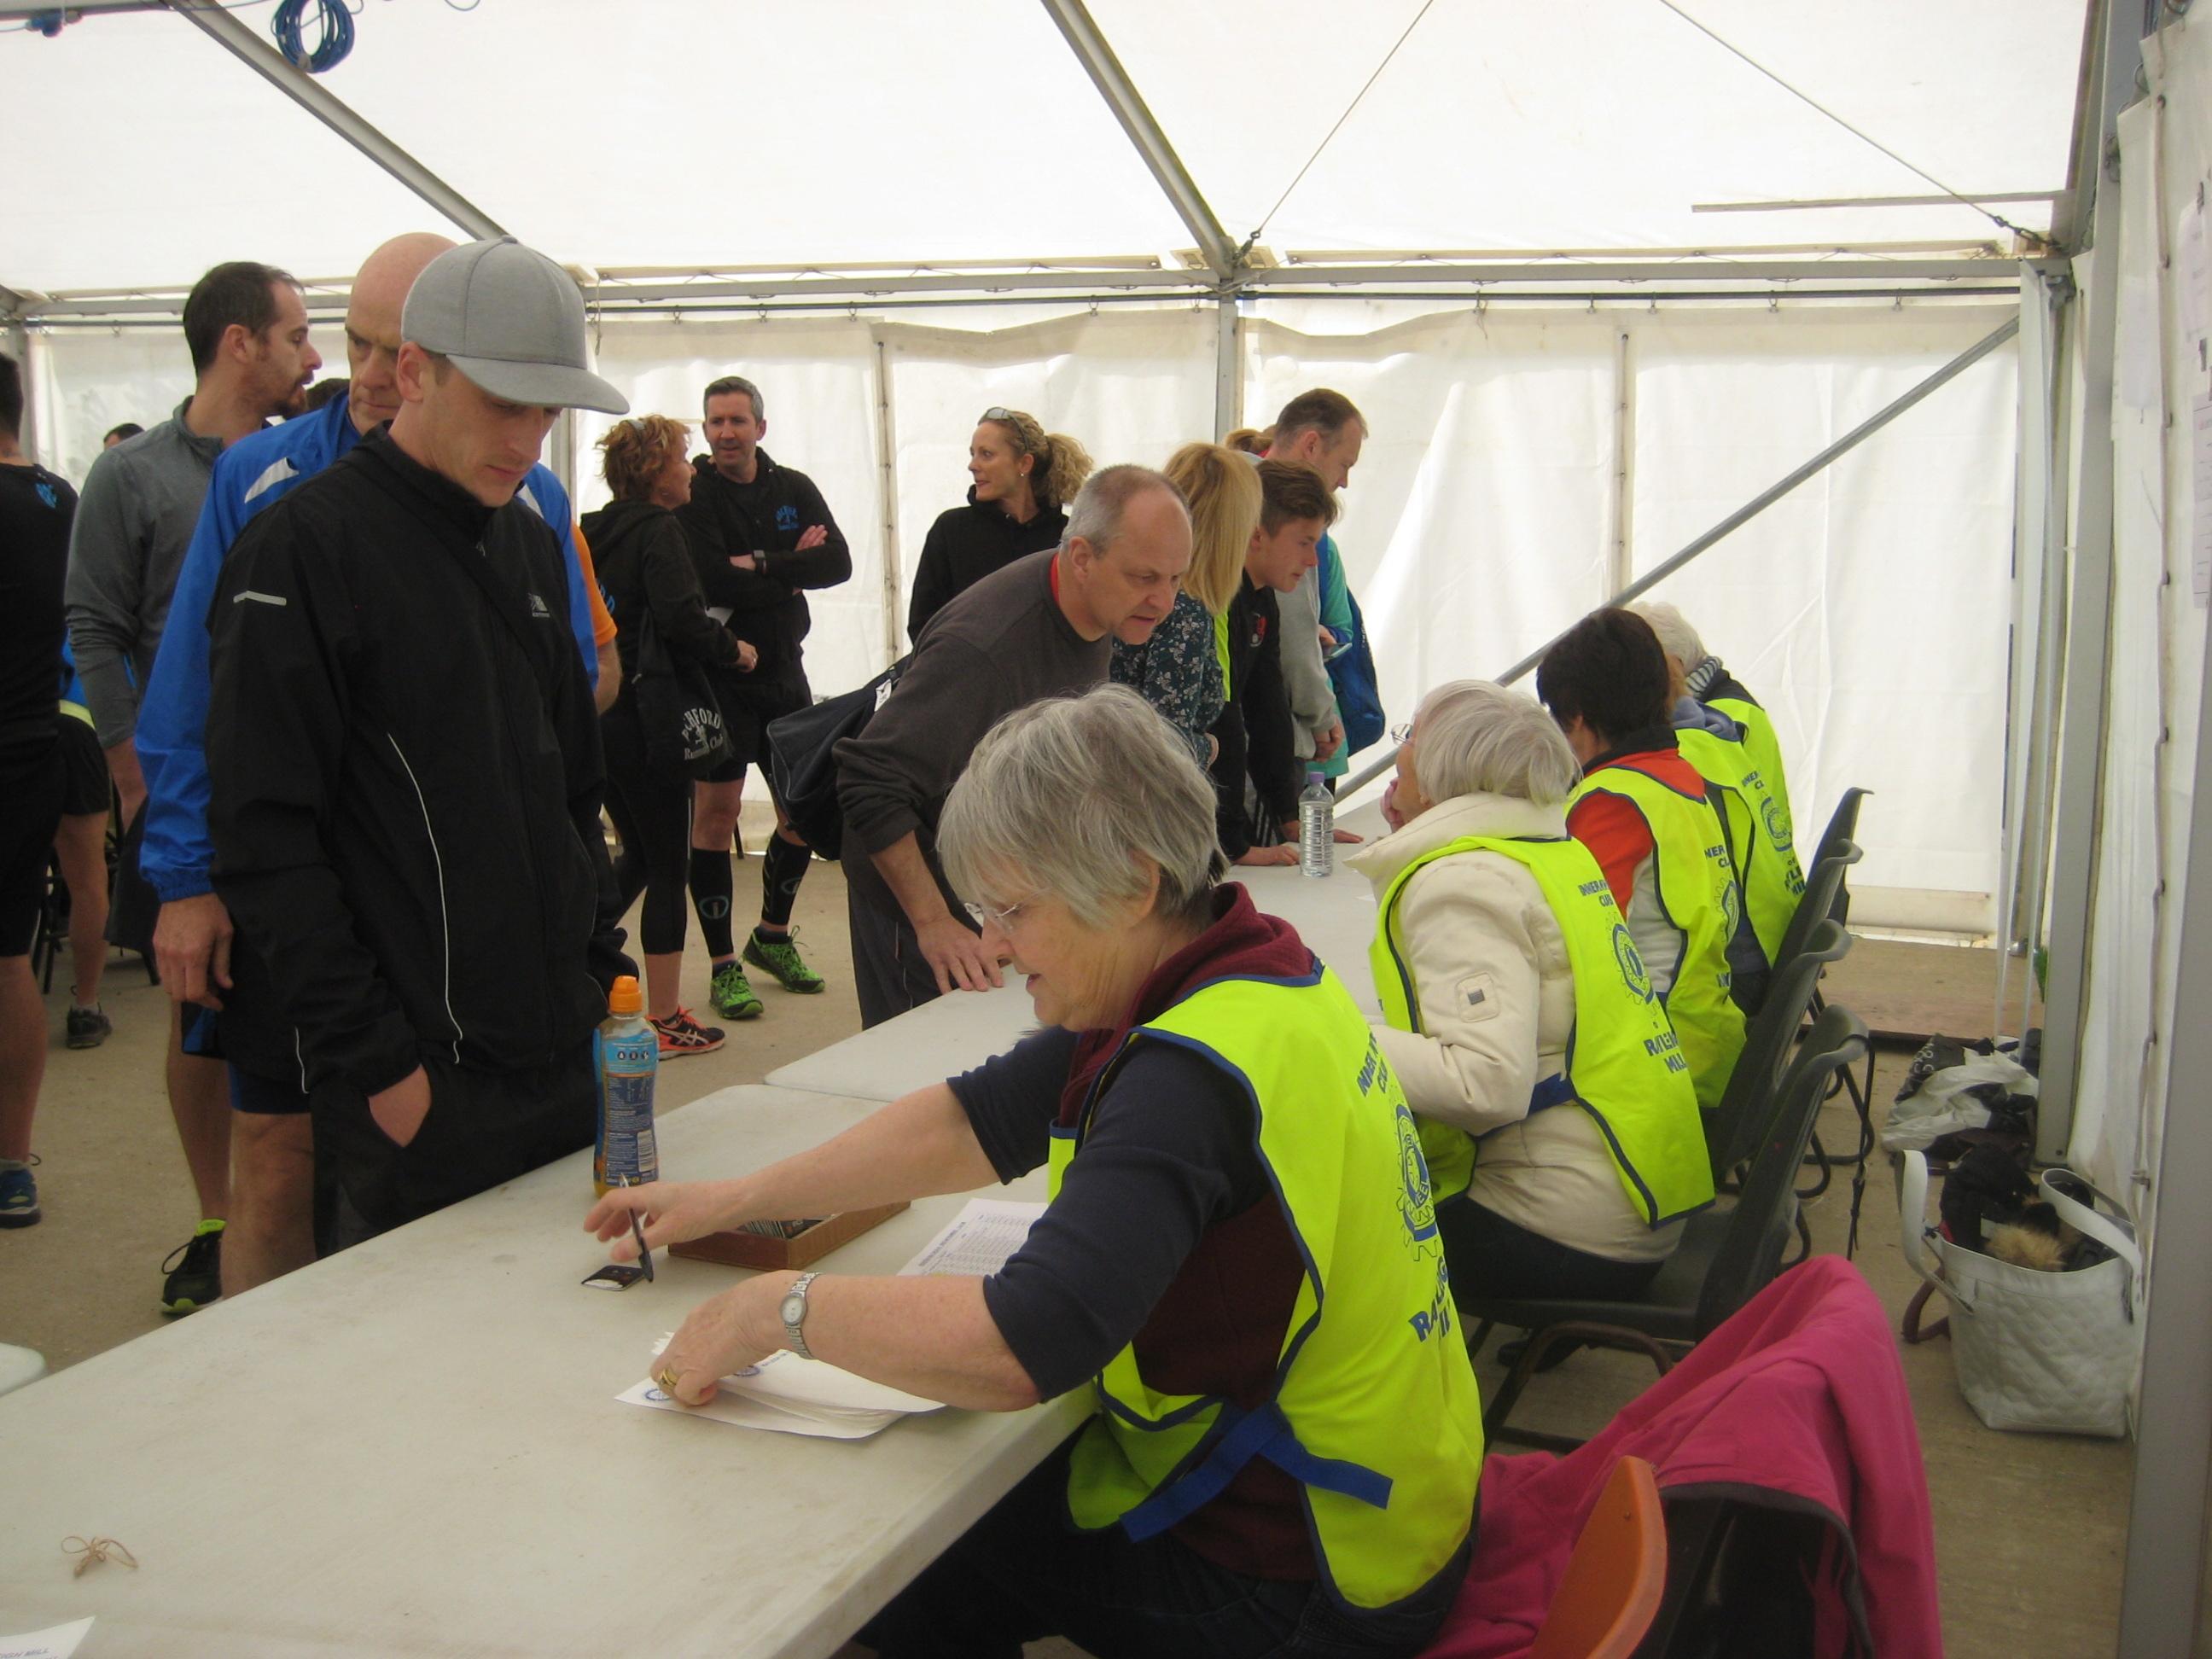 registering the runners